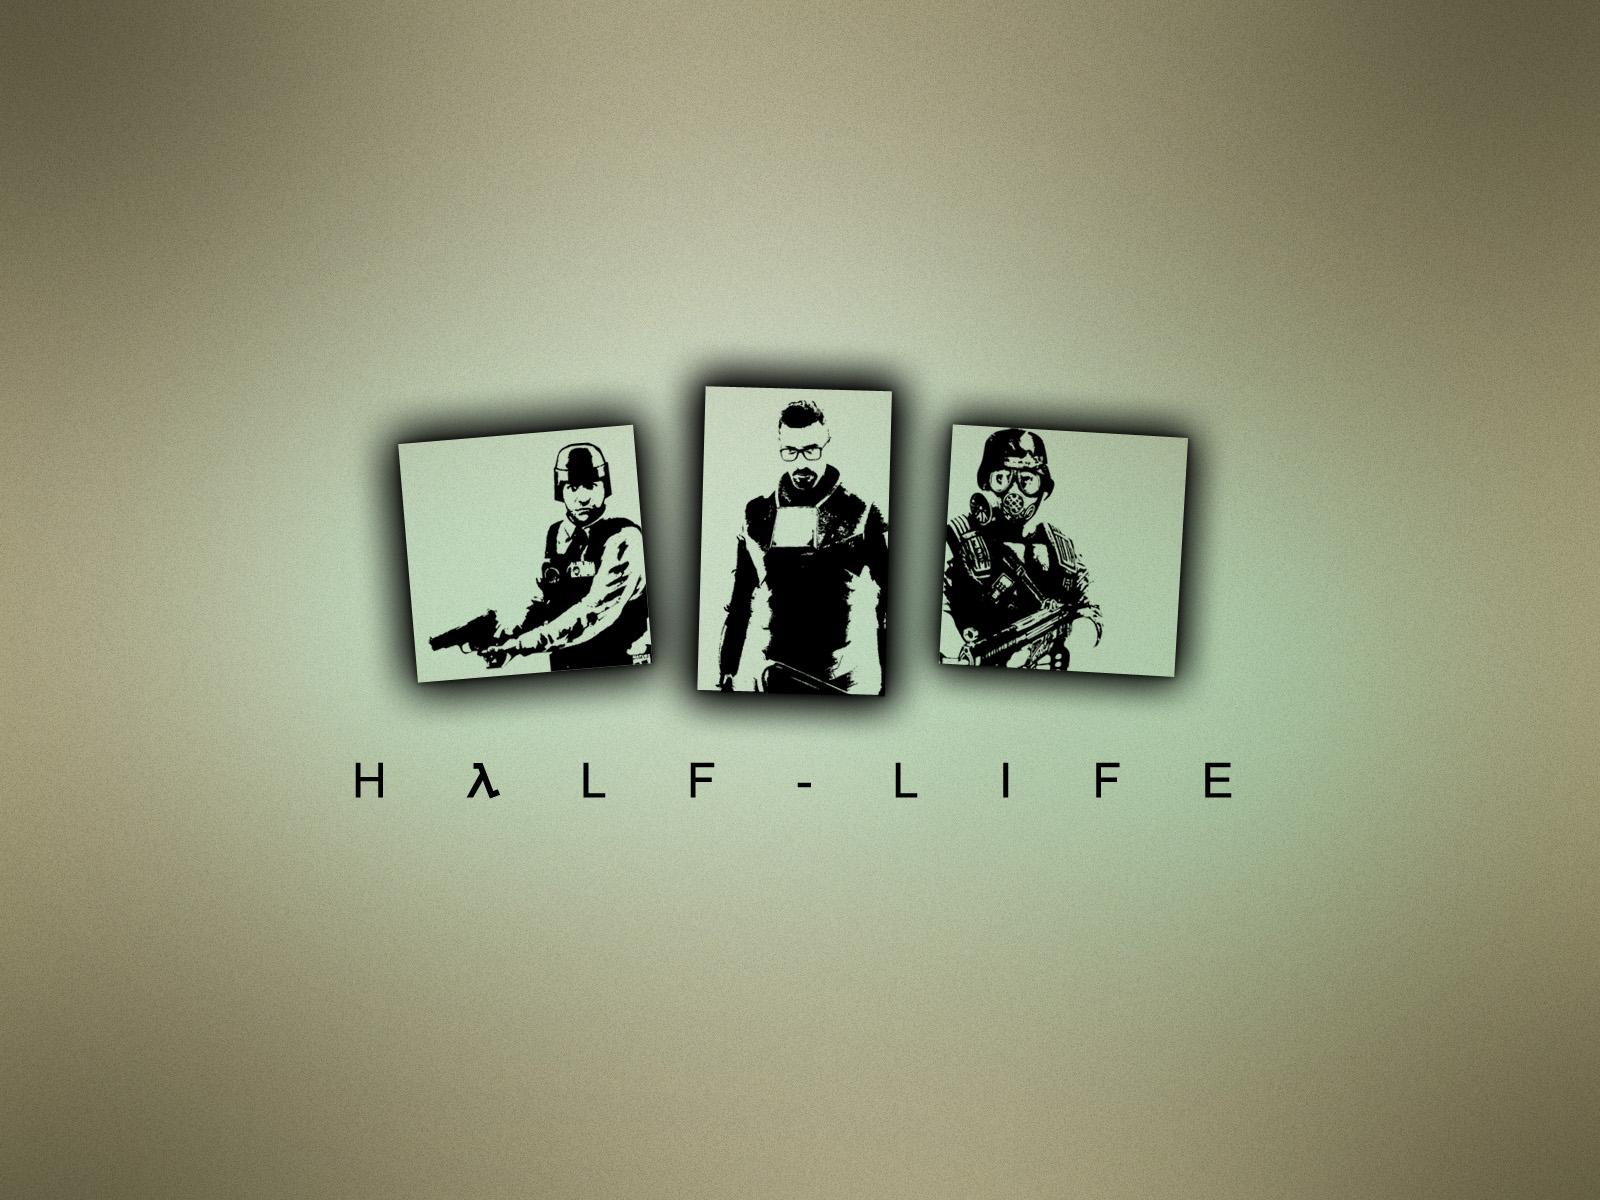 Half Life Wallpapers